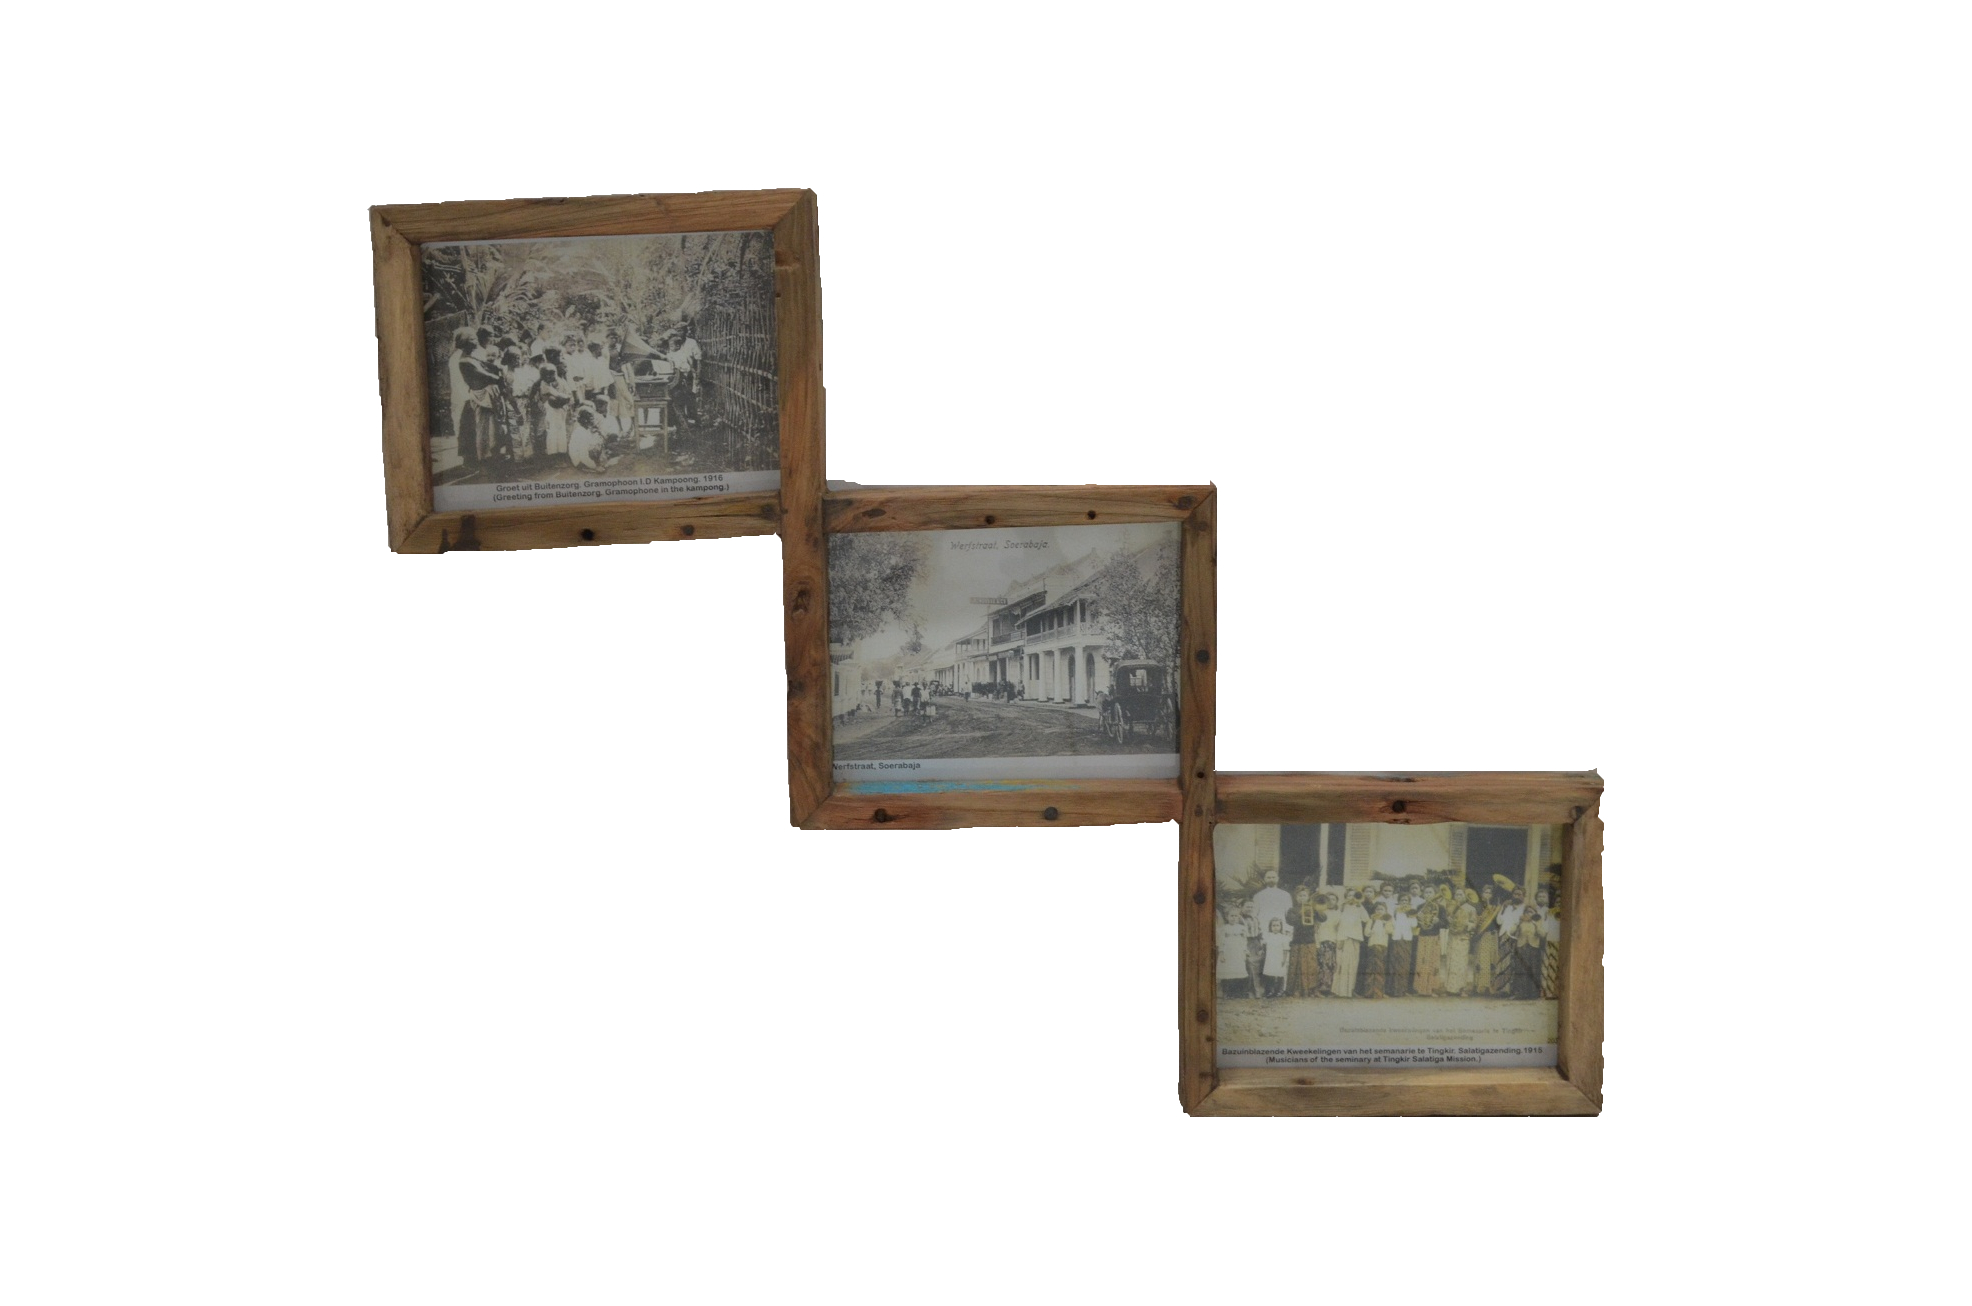 Fotorahmen kunst wand deko dekoration vintage old